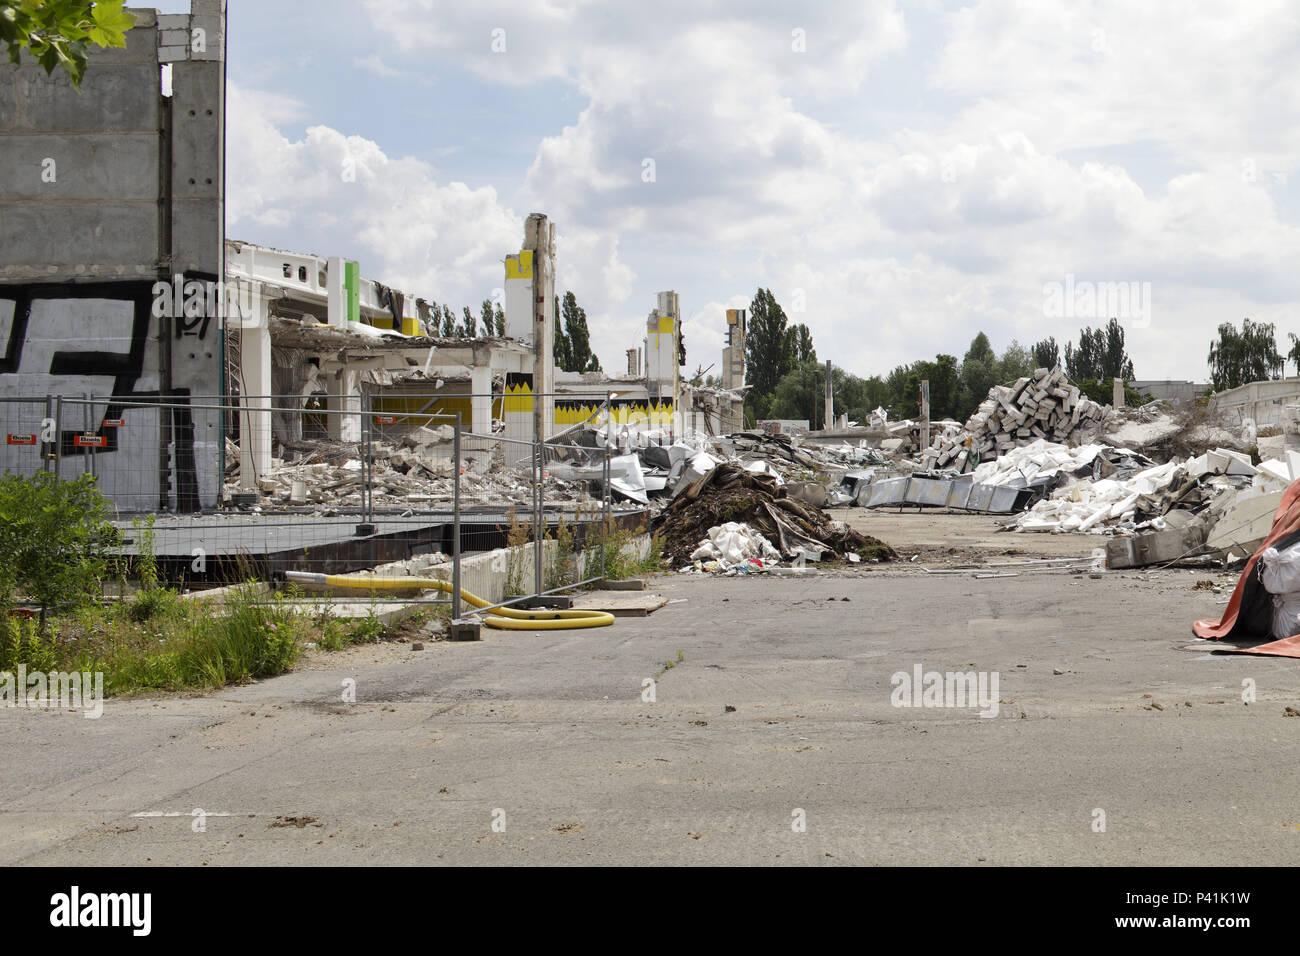 Berlin, Germany, Demolition Of A Furniture House In The Landsberger Allee  In Berlin Lichtenberg